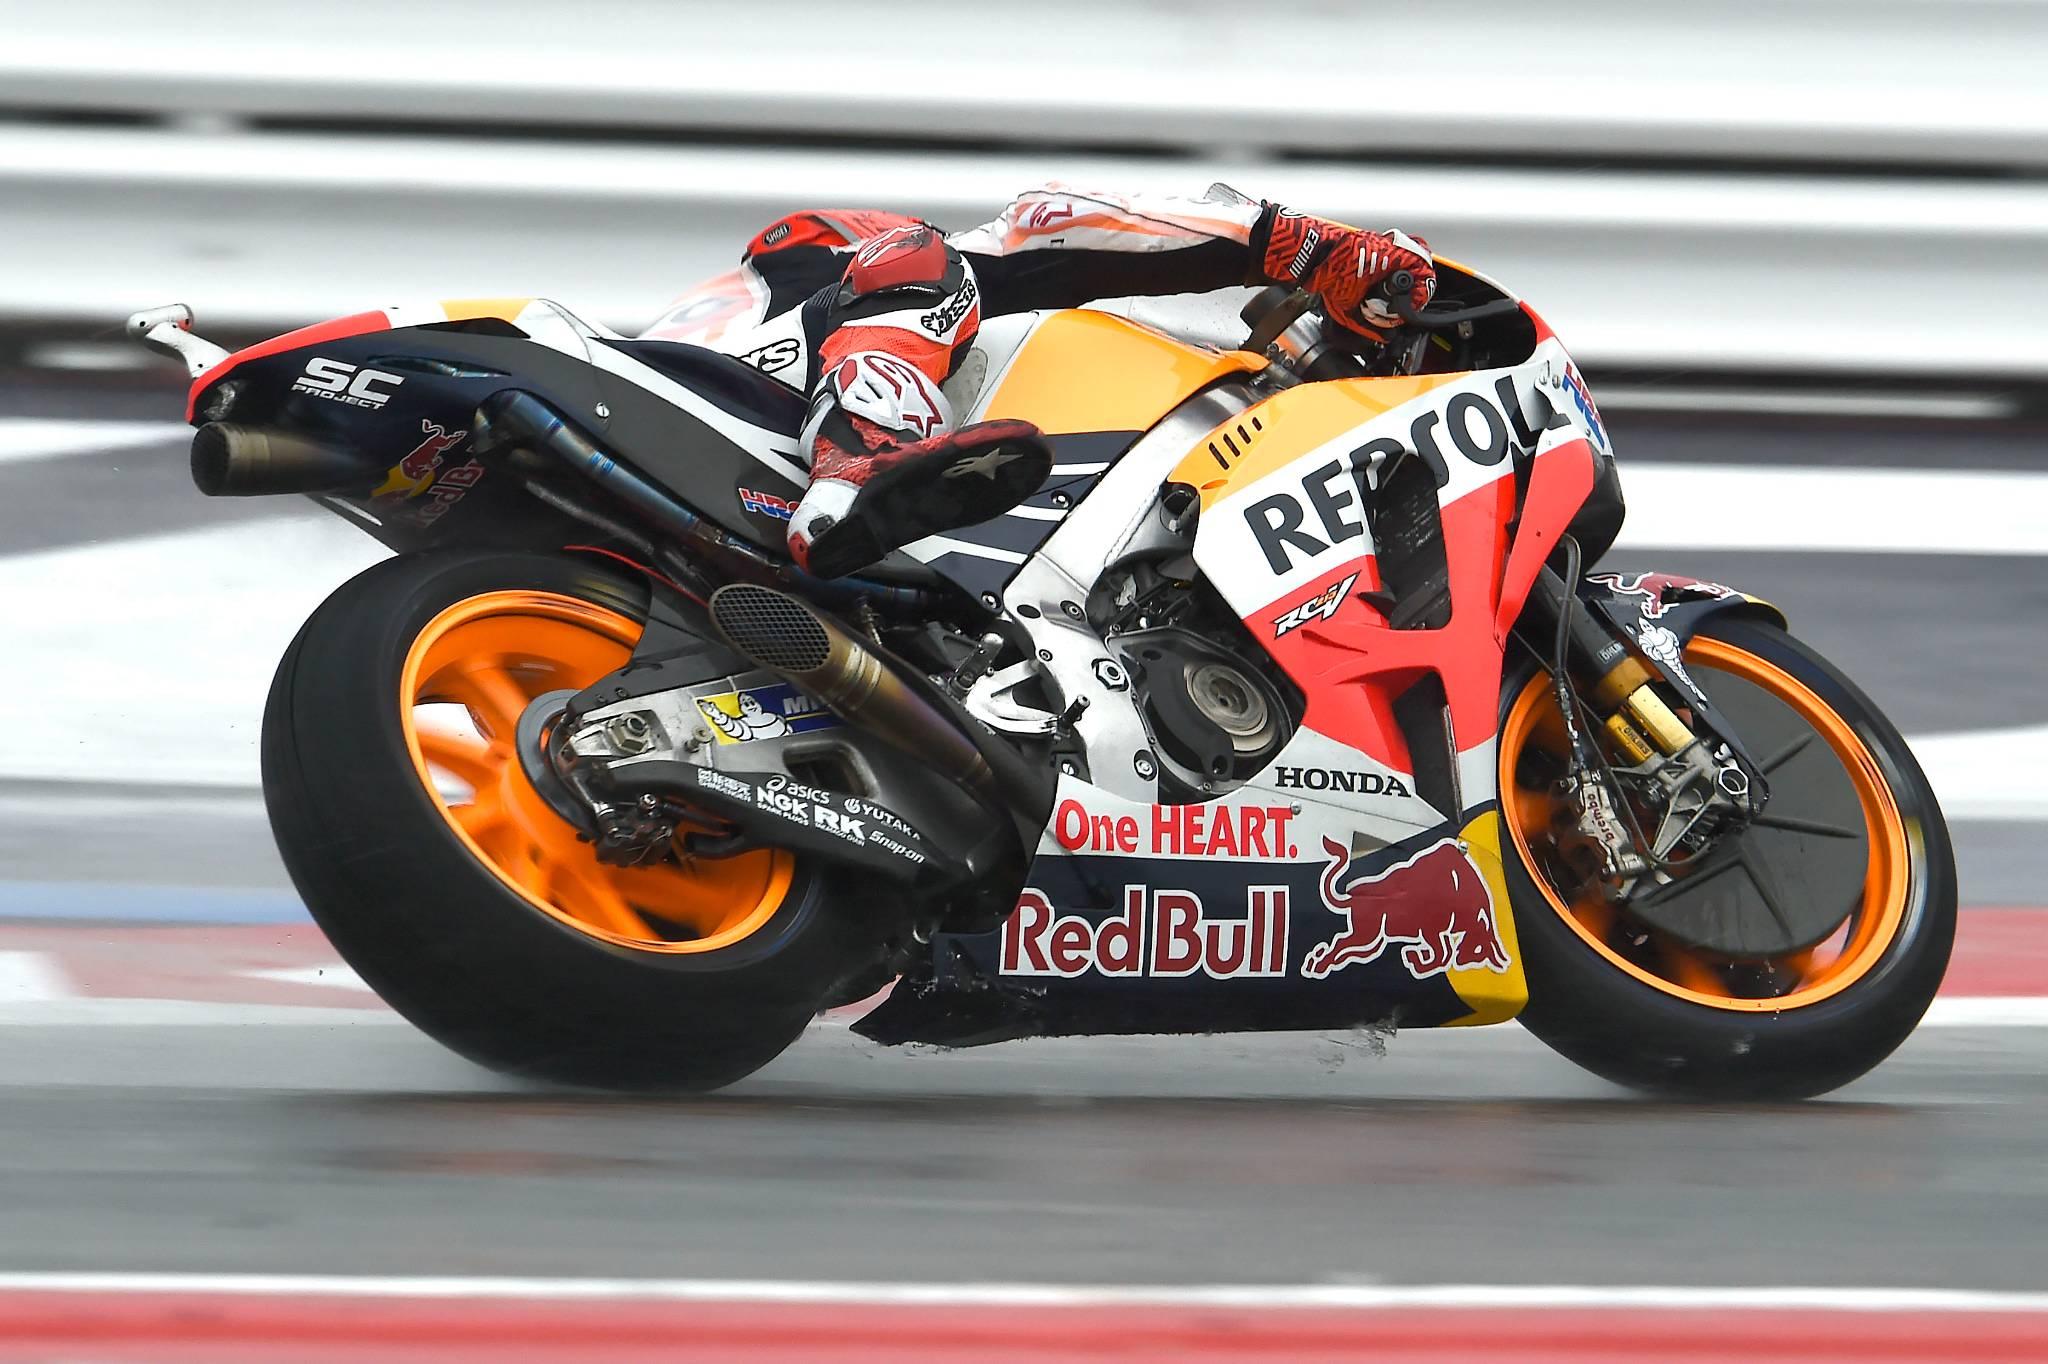 MotoGP: 2017 San Marino MotoGP, Misano - Race Results | Results | Crash